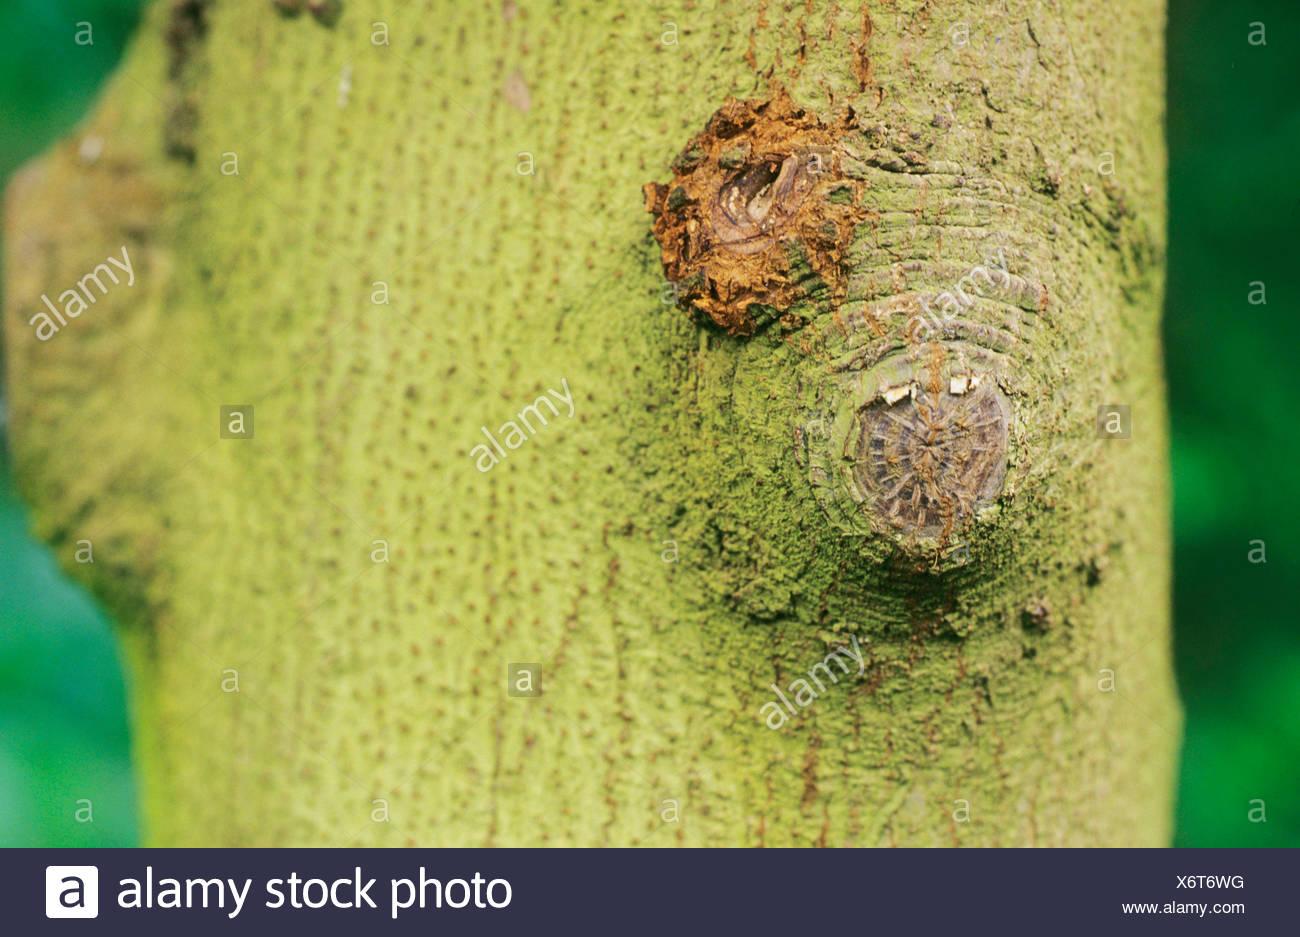 karaka nut, New Zealand Laurel (Corynocarpus laevigatus), bark - Stock Image